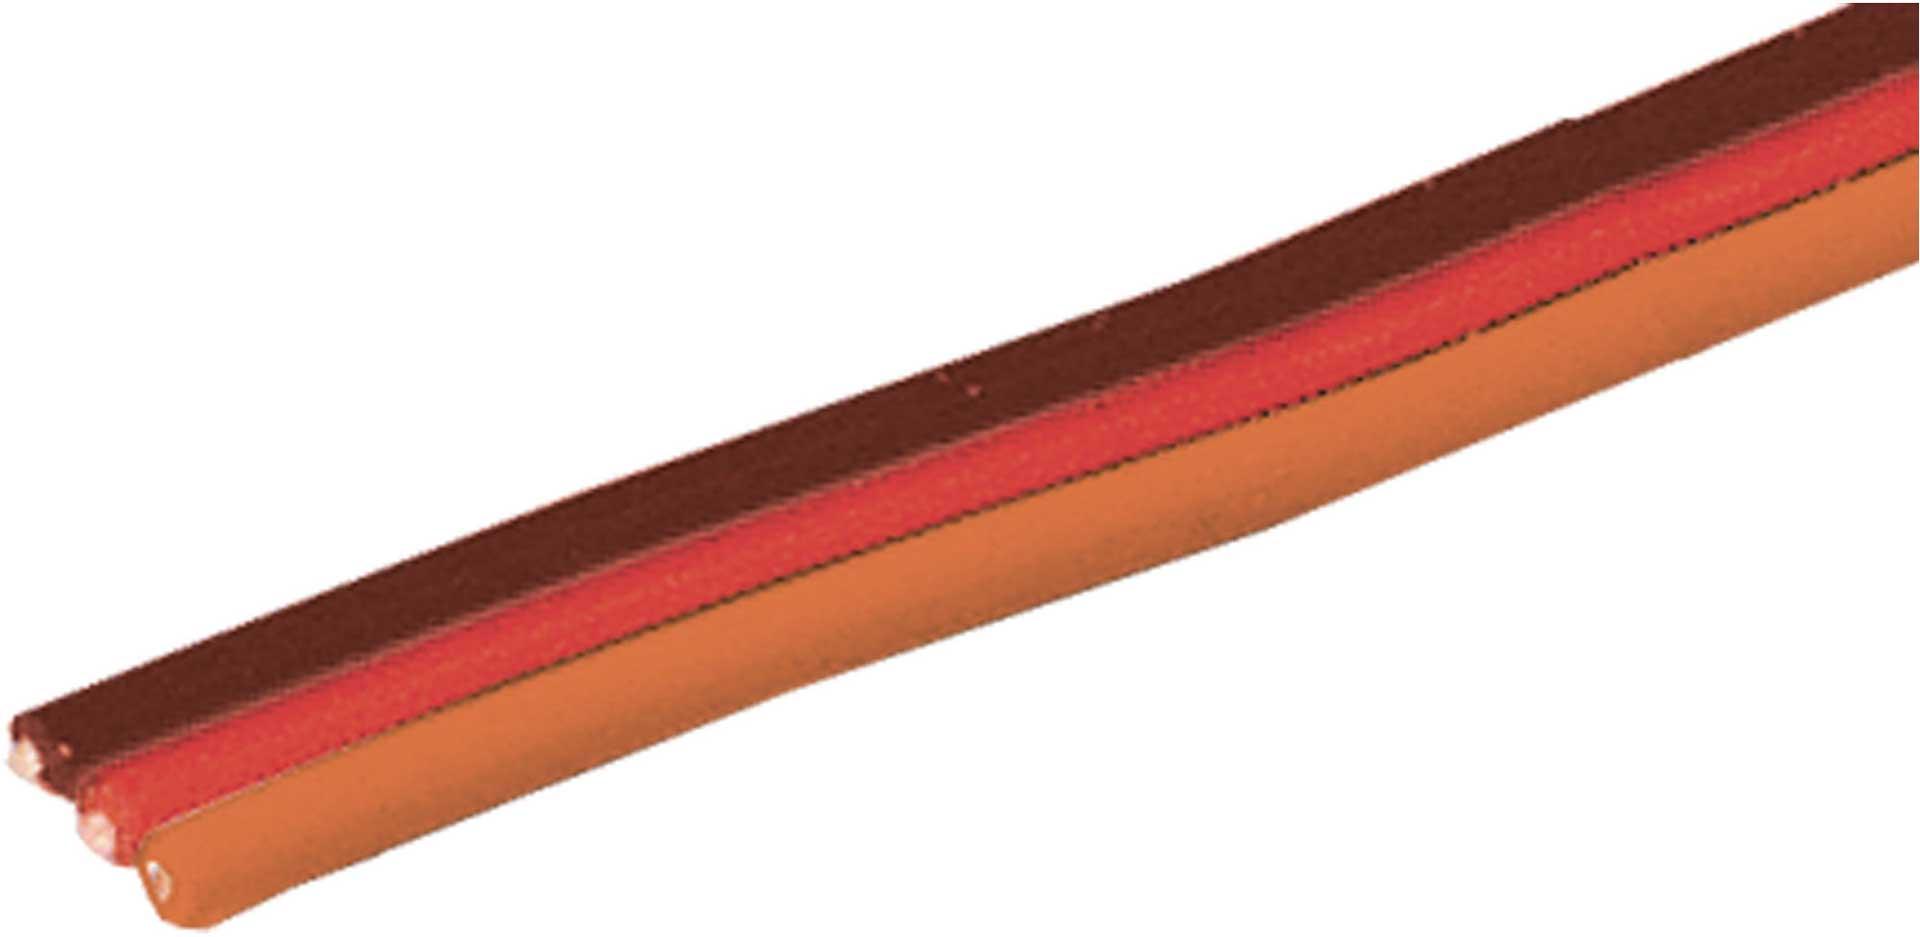 Robbe Modellsport Servokabel Graupner/JR/Uni 100 Meter flach 0,33mm² (22AWG) PVC Meterware